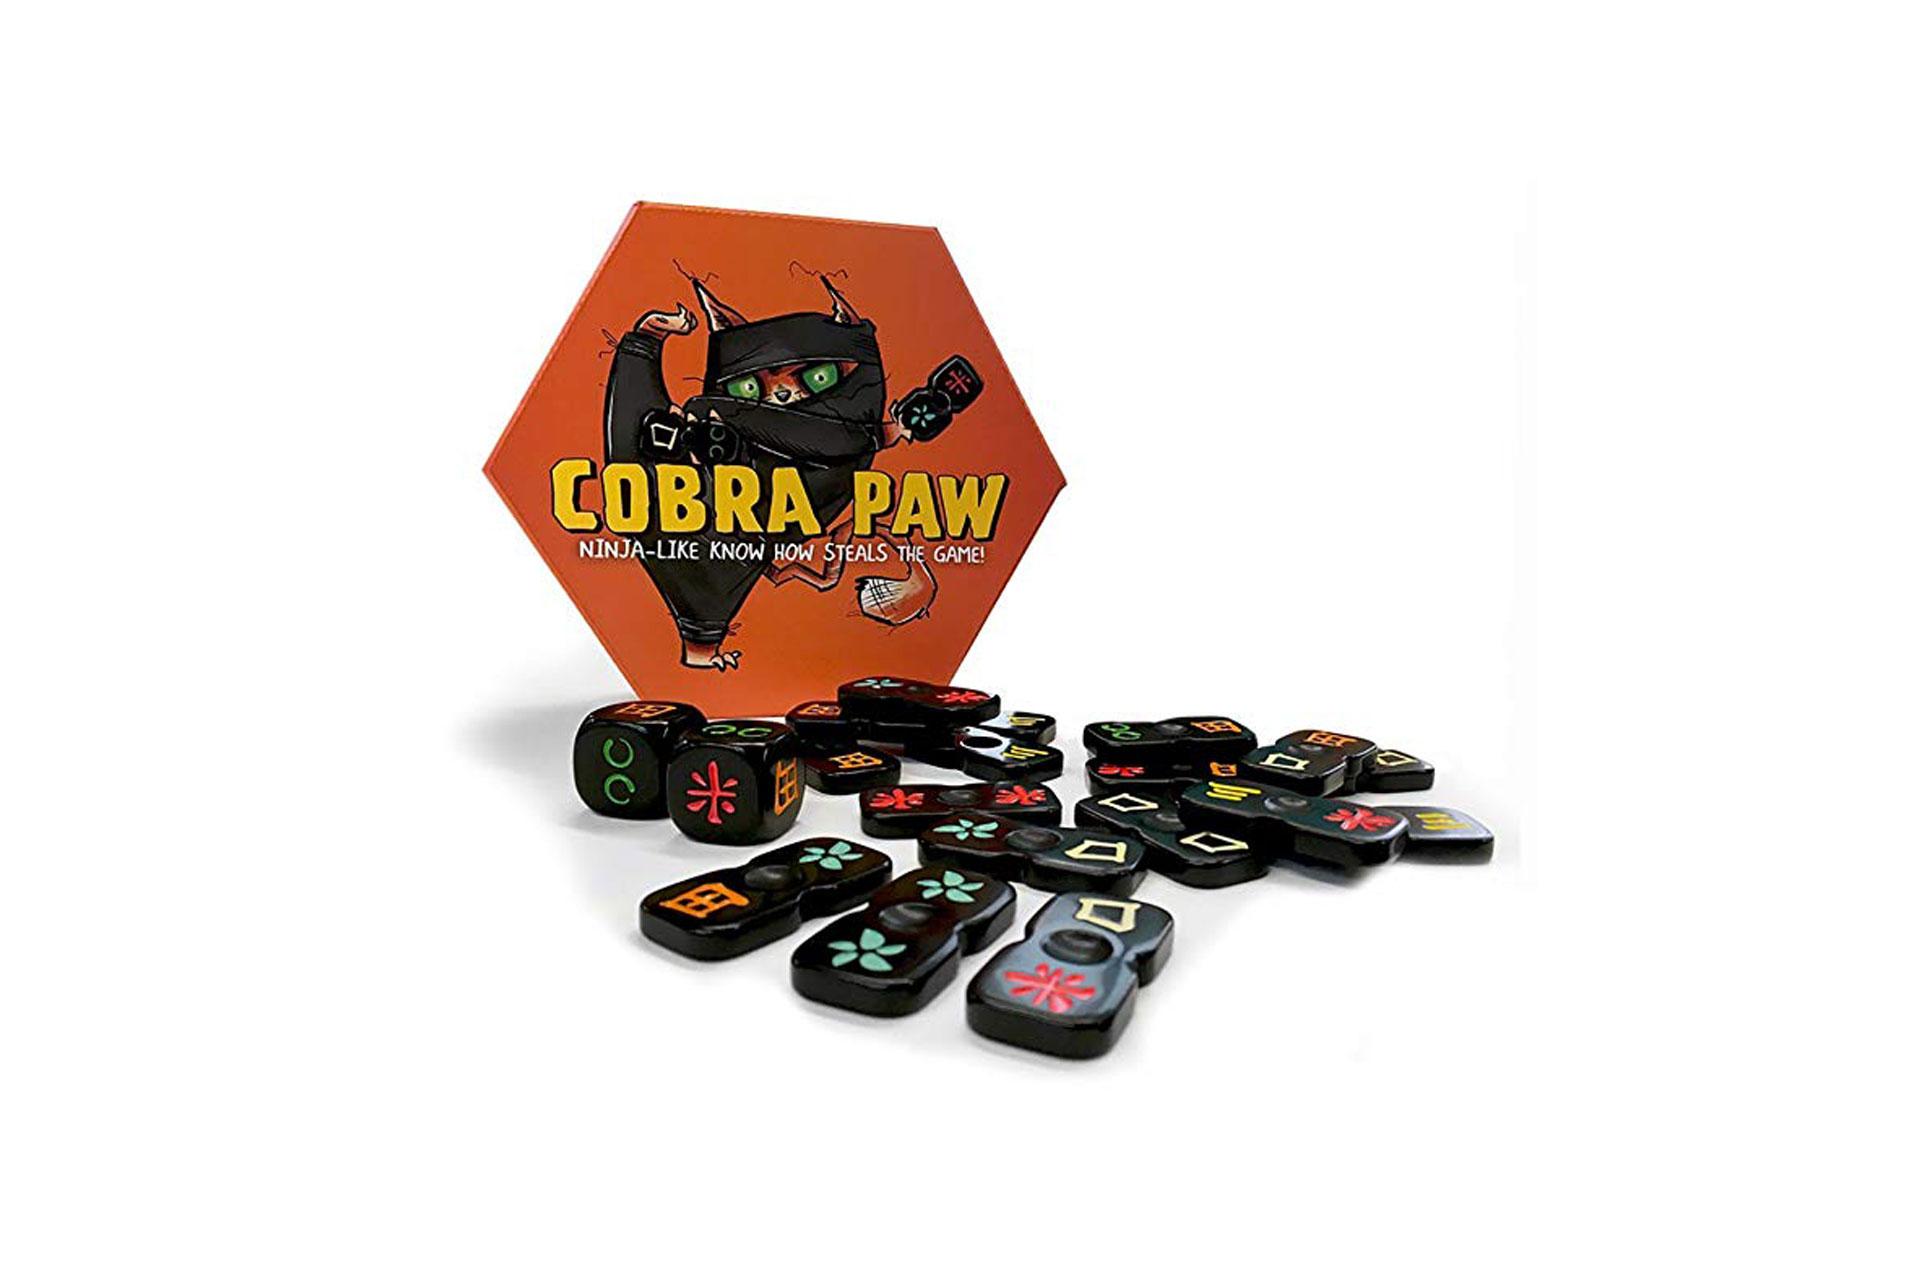 Cobra Paw Travel Game; Courtesy of Amazon